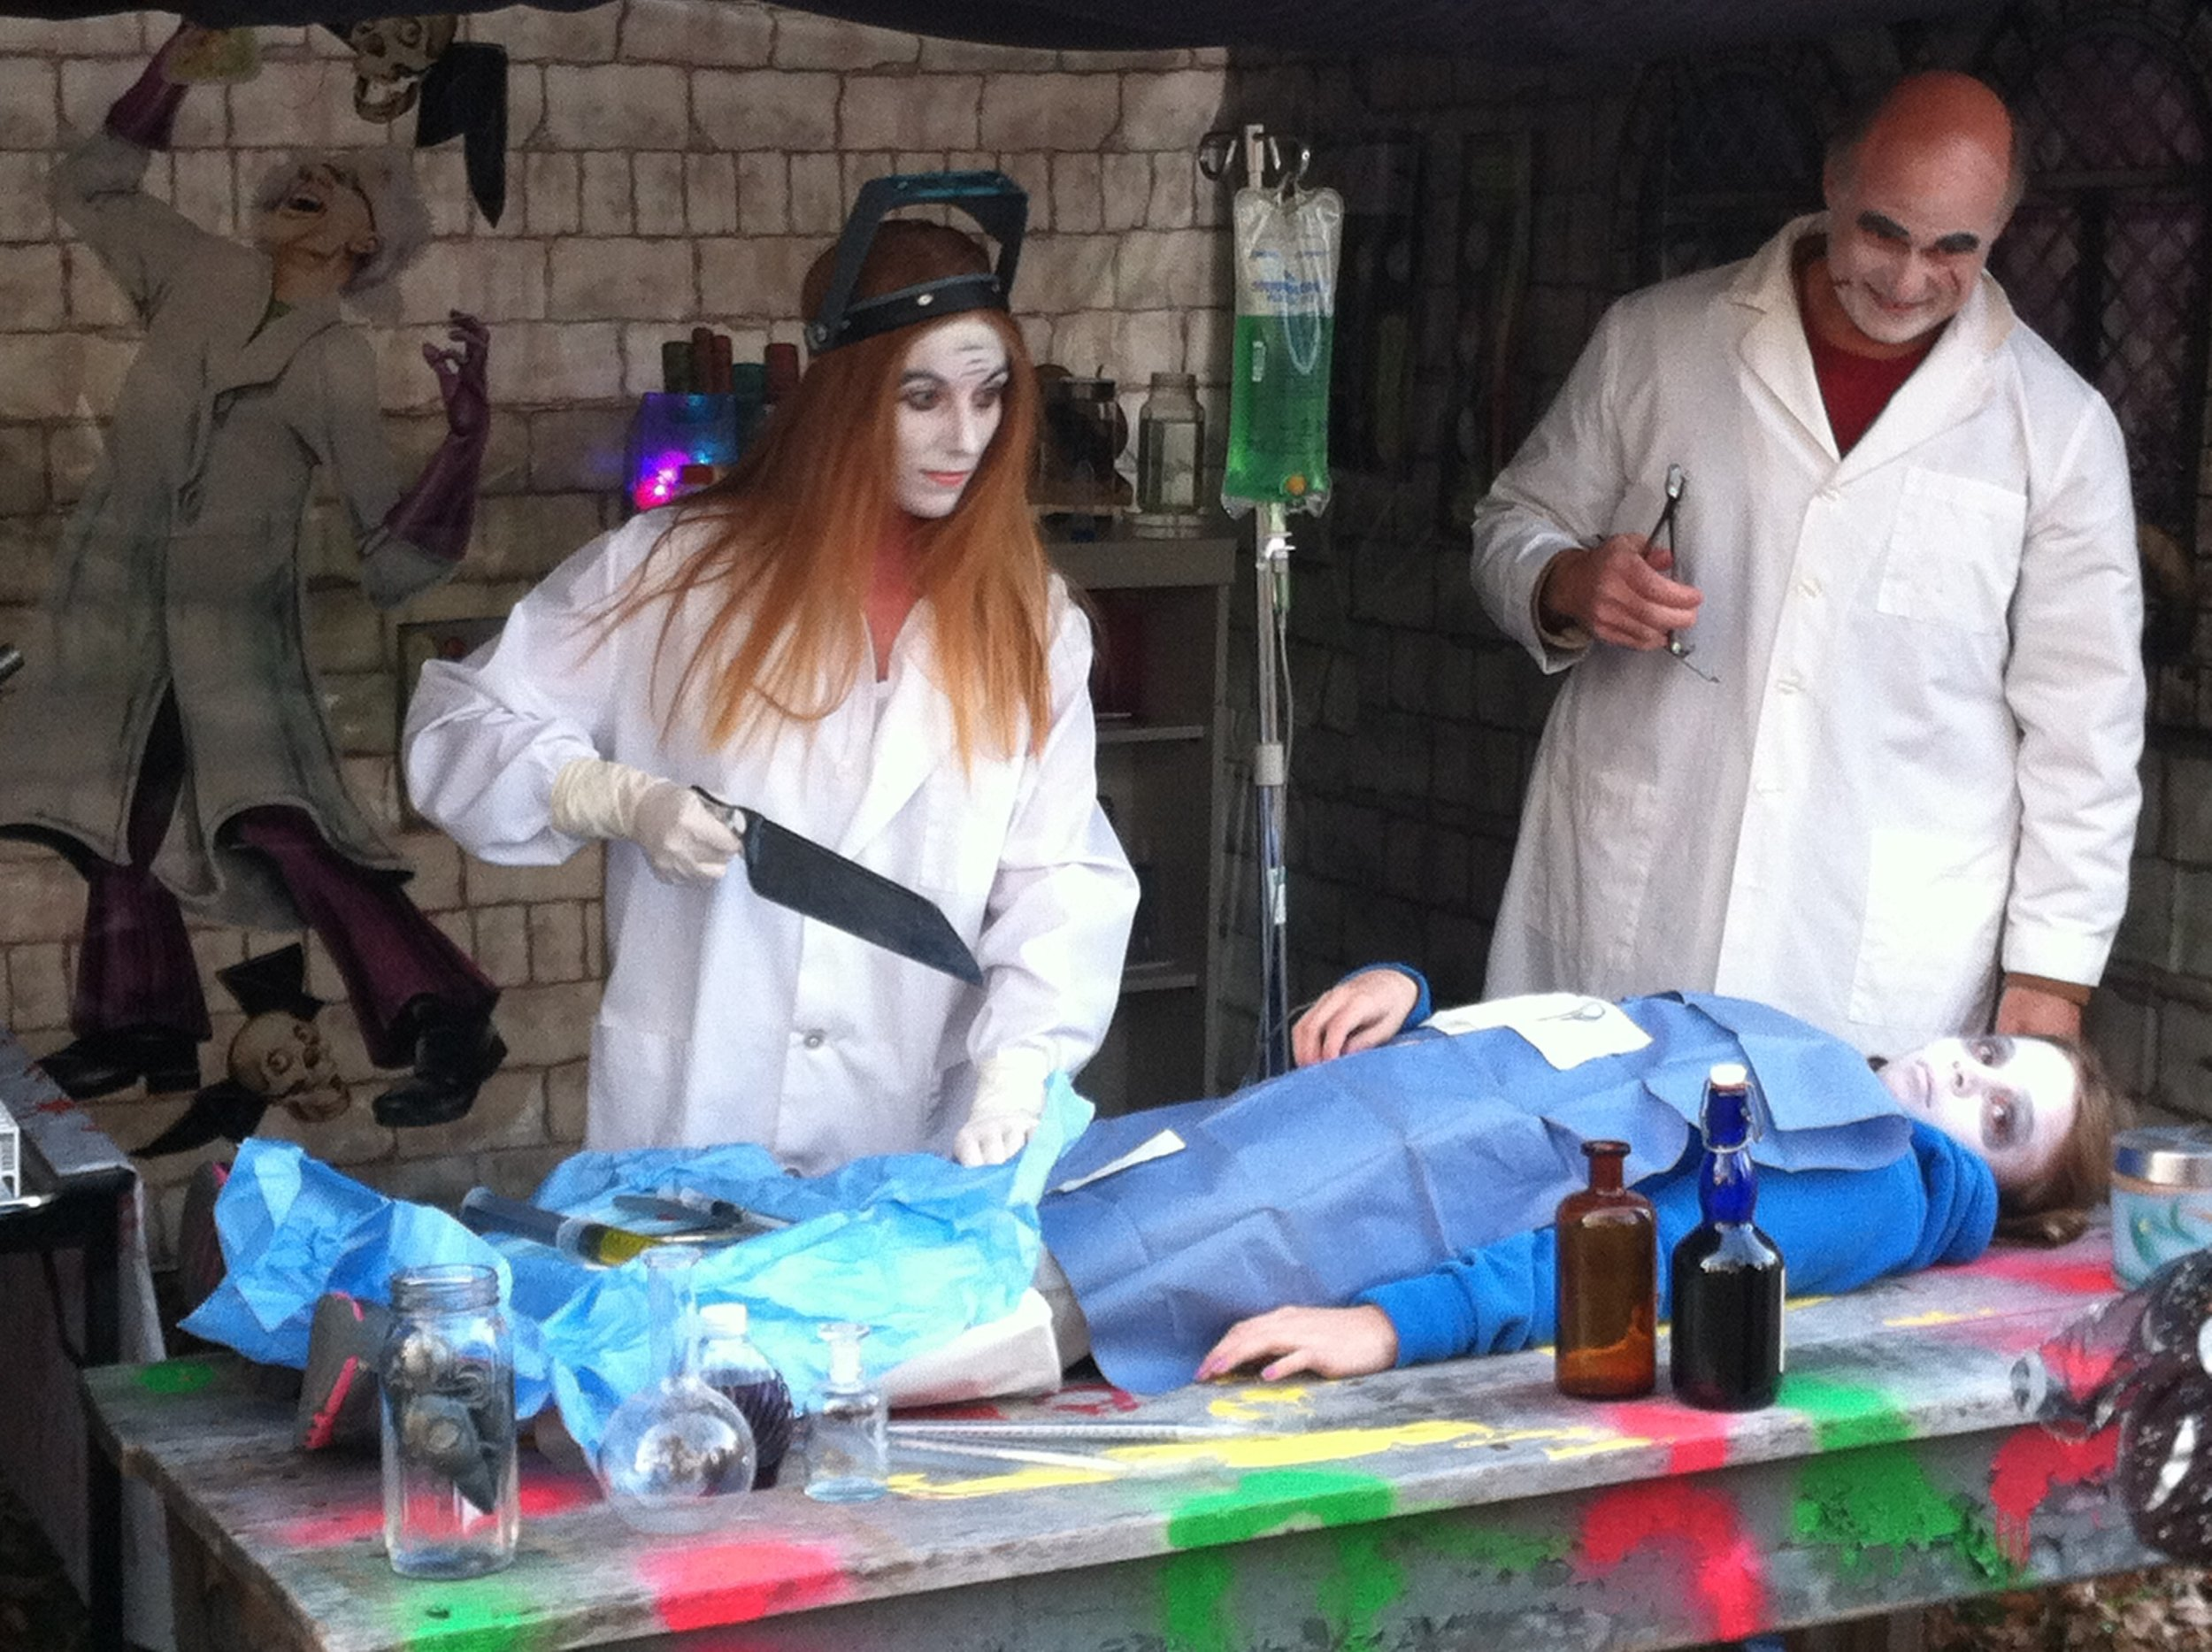 Halloweek Mad Scientist 1.jpg